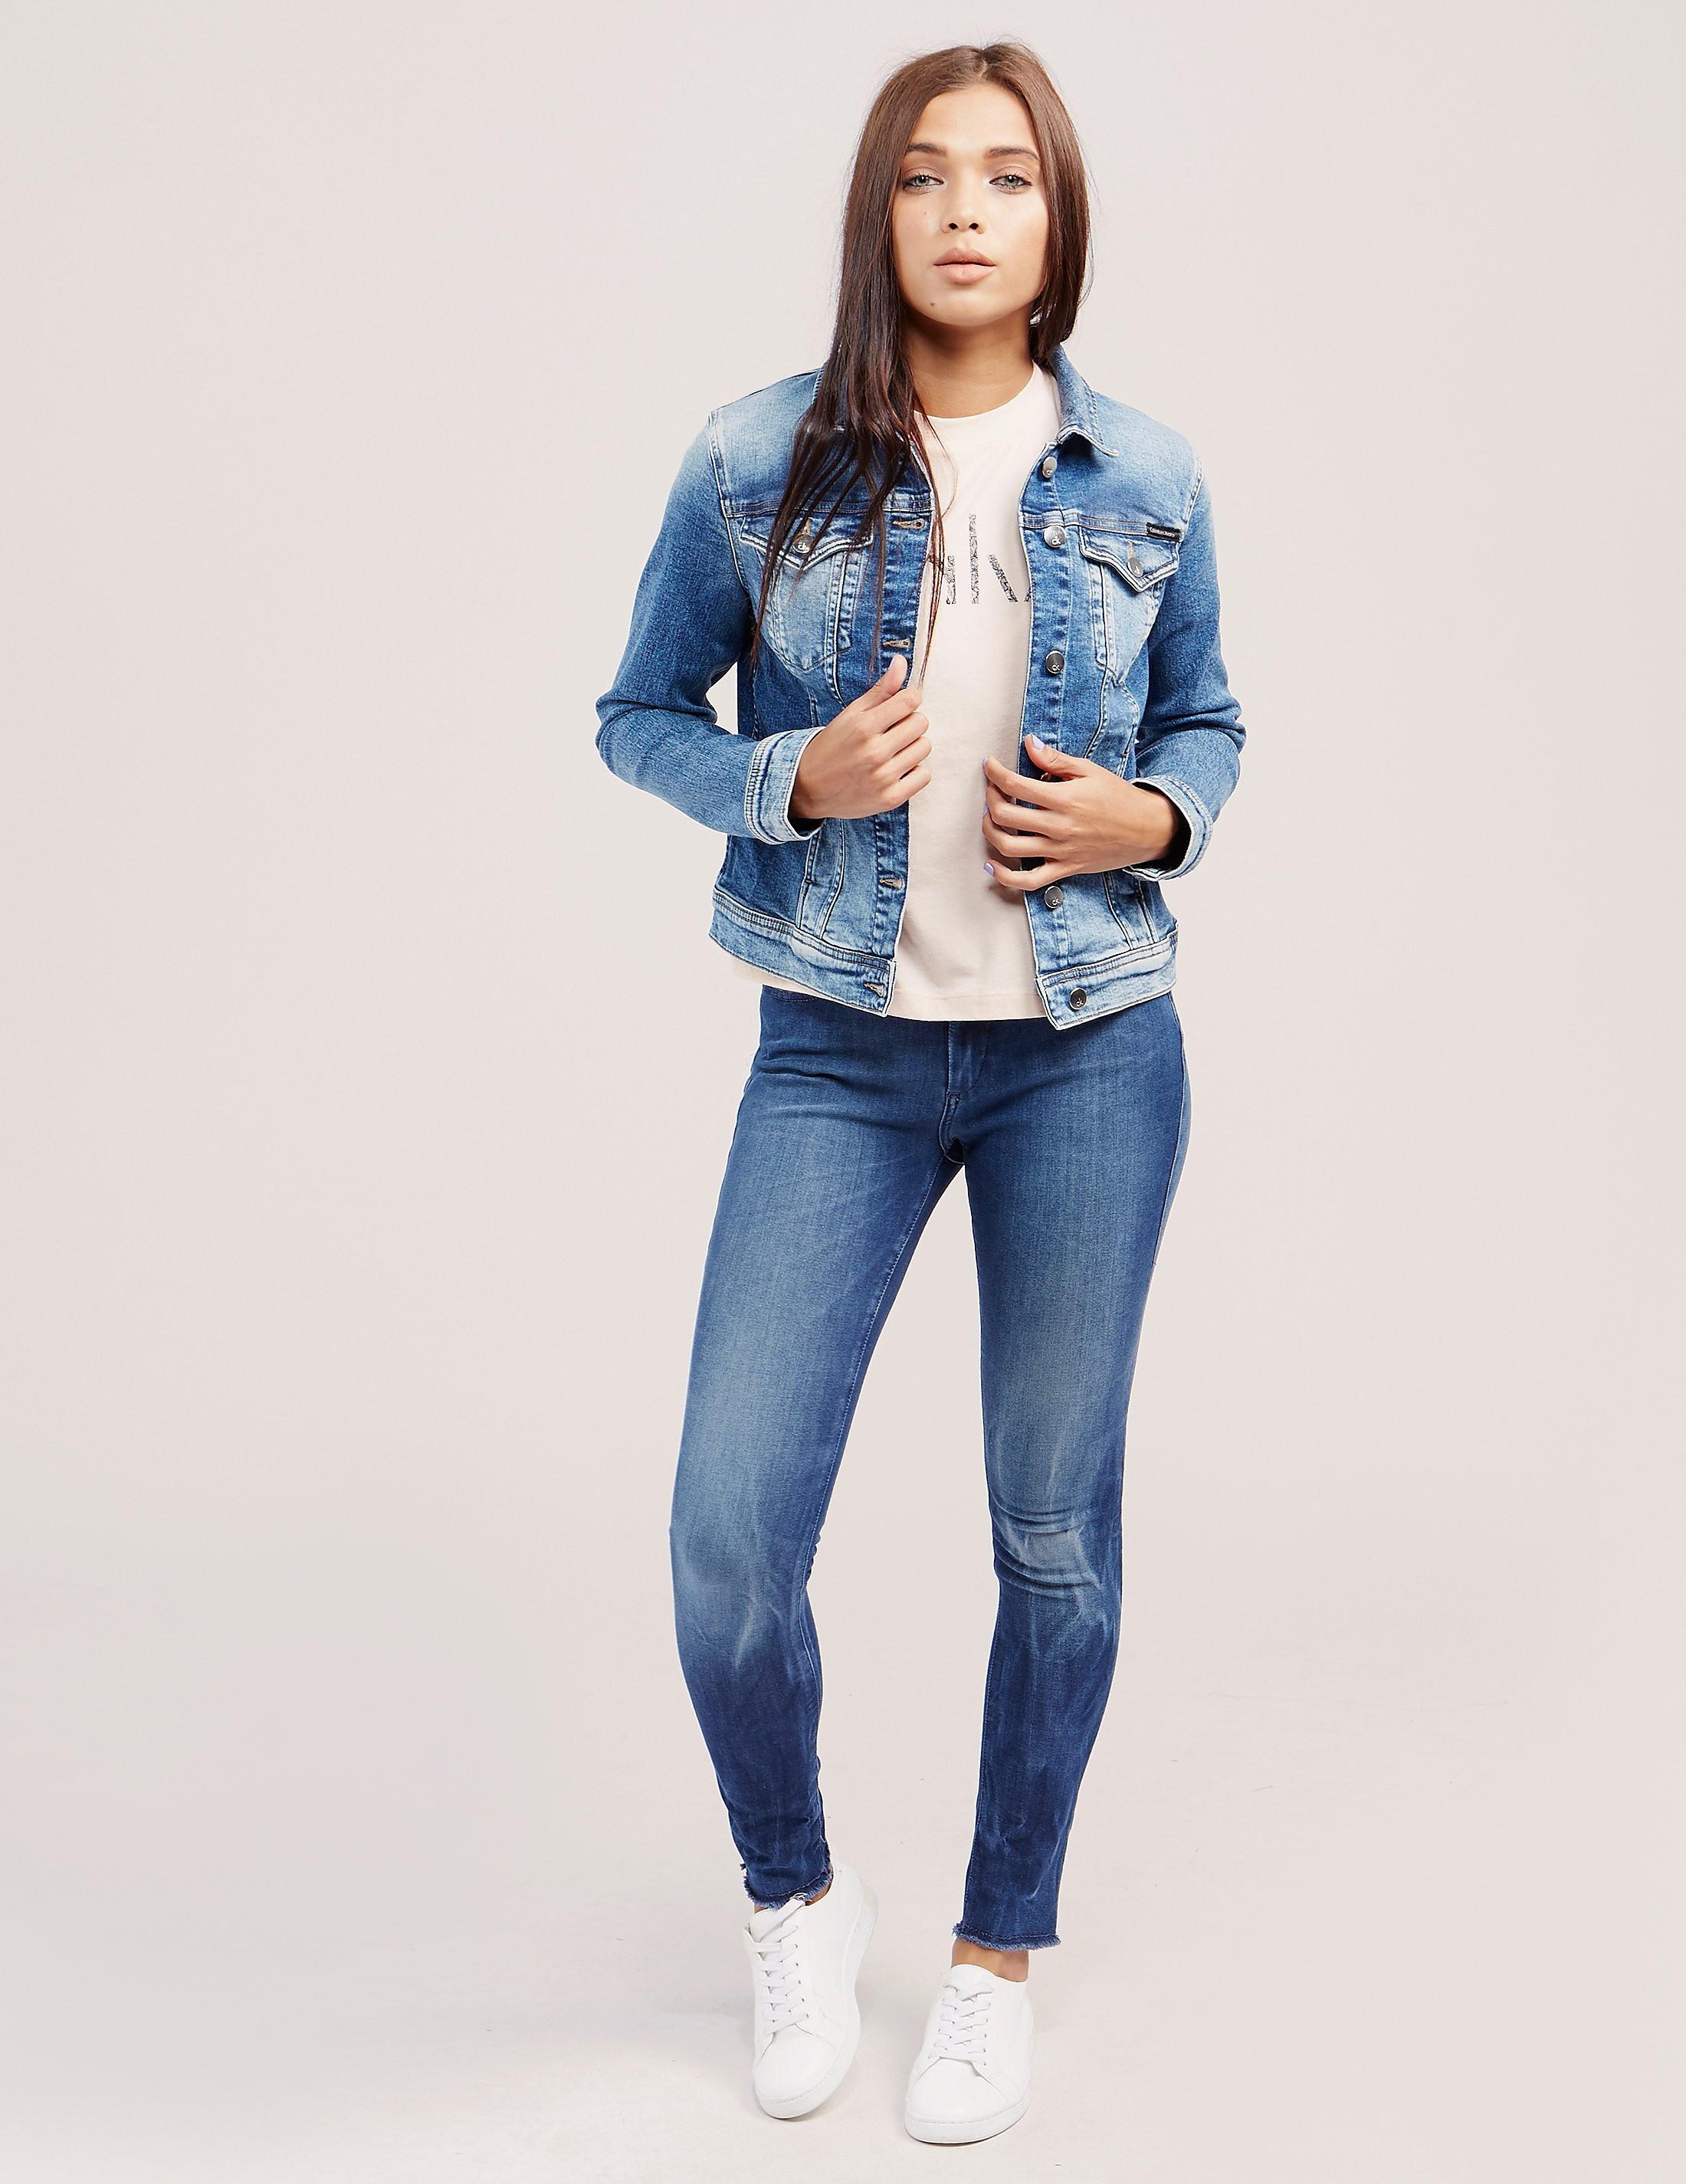 Calvin Klein Jet Trucker Denim Jacket - Online Exclusive